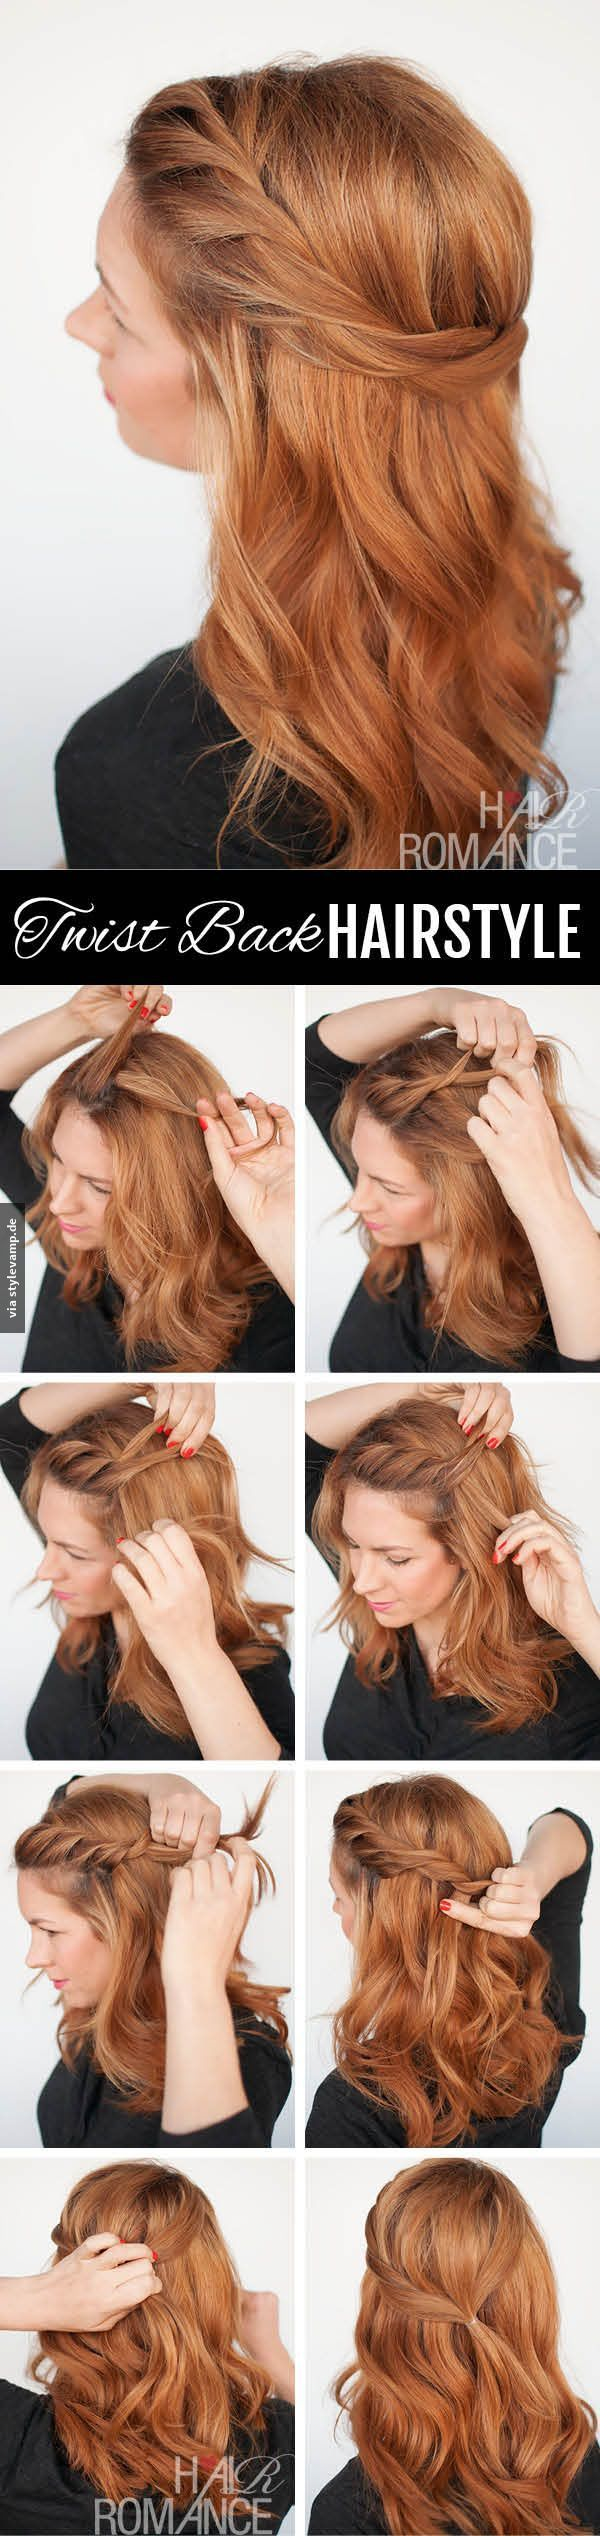 best hippie frisur images on pinterest hairstyle ideas hair